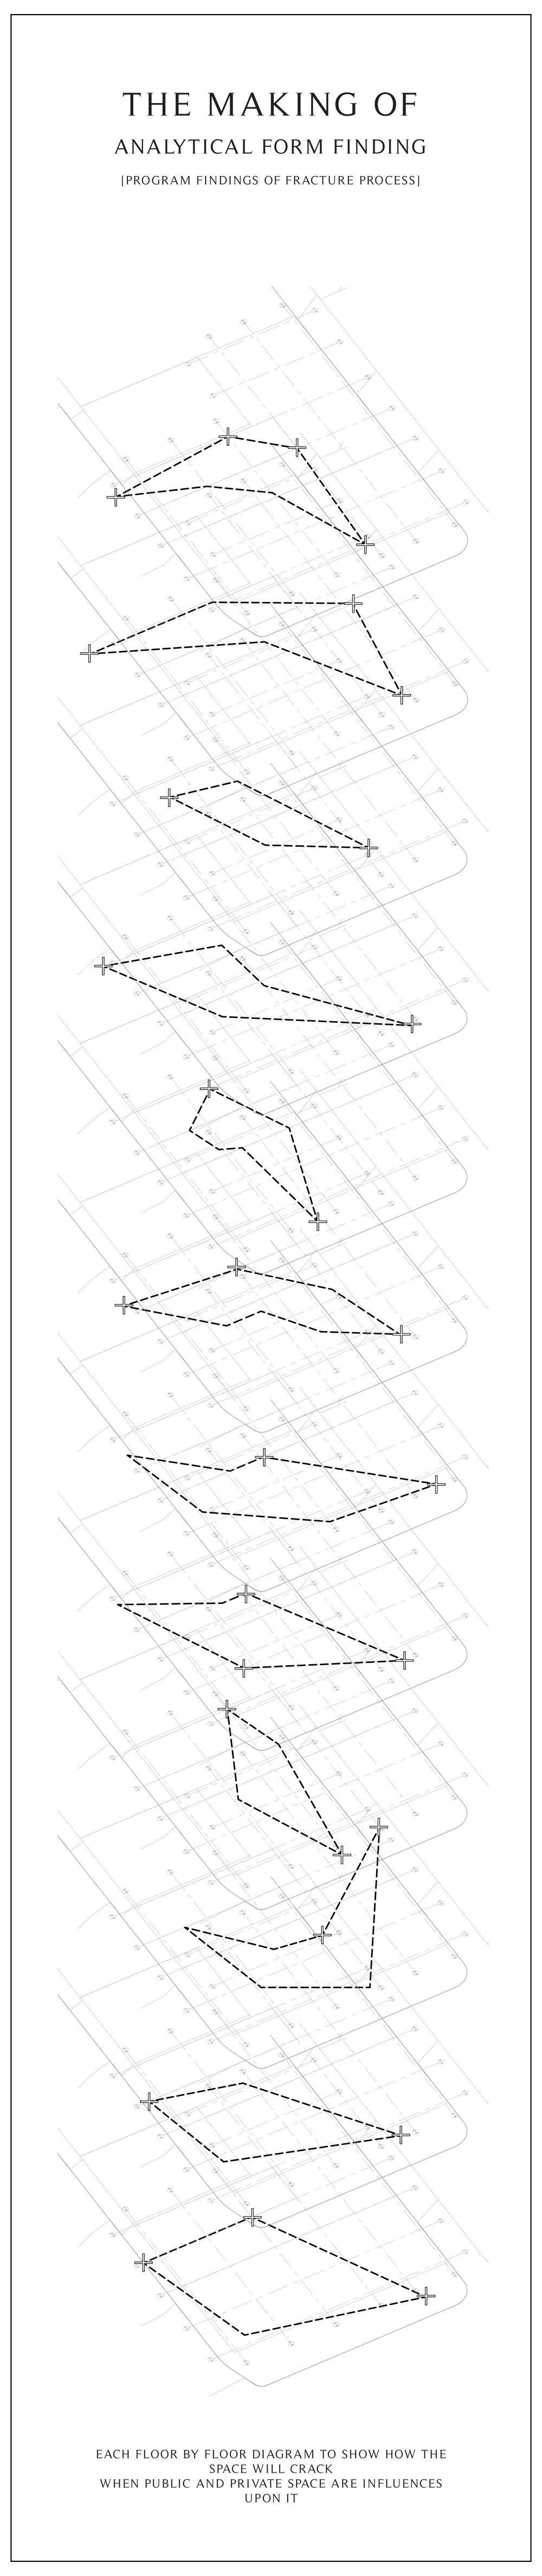 009-form-finding-min.jpg